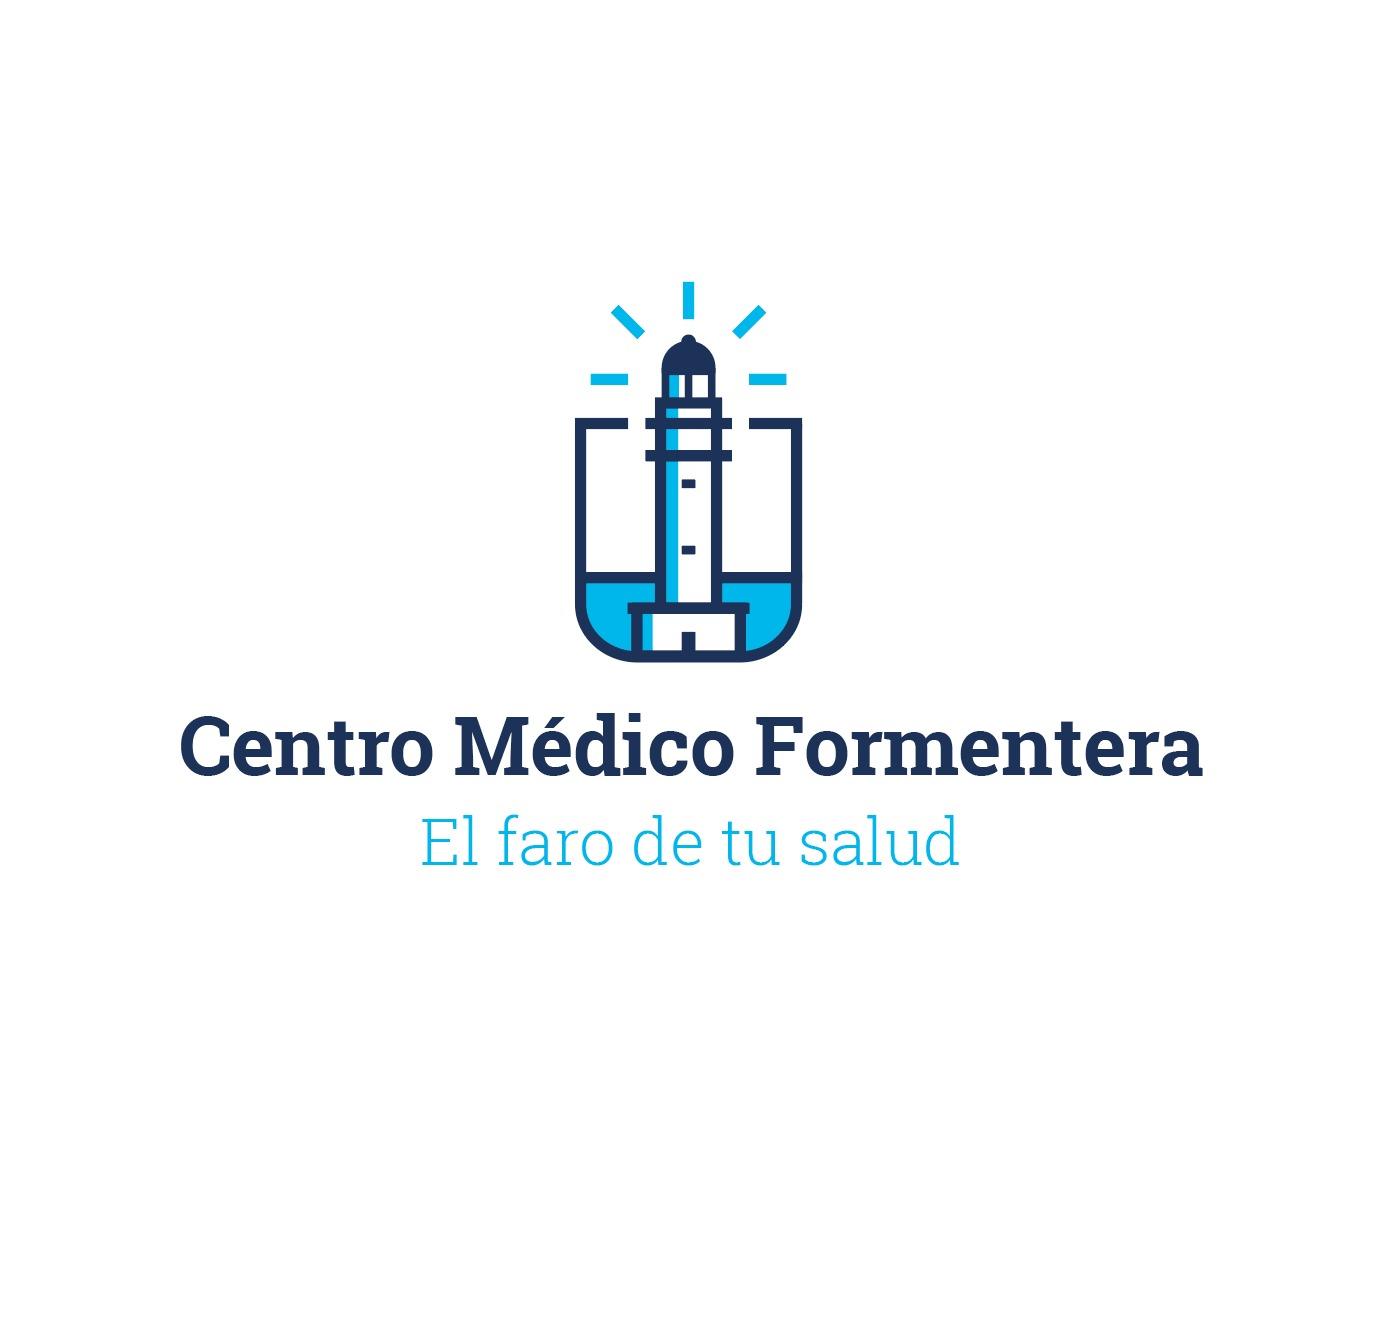 CENTRO MEDICO FORMENTERA